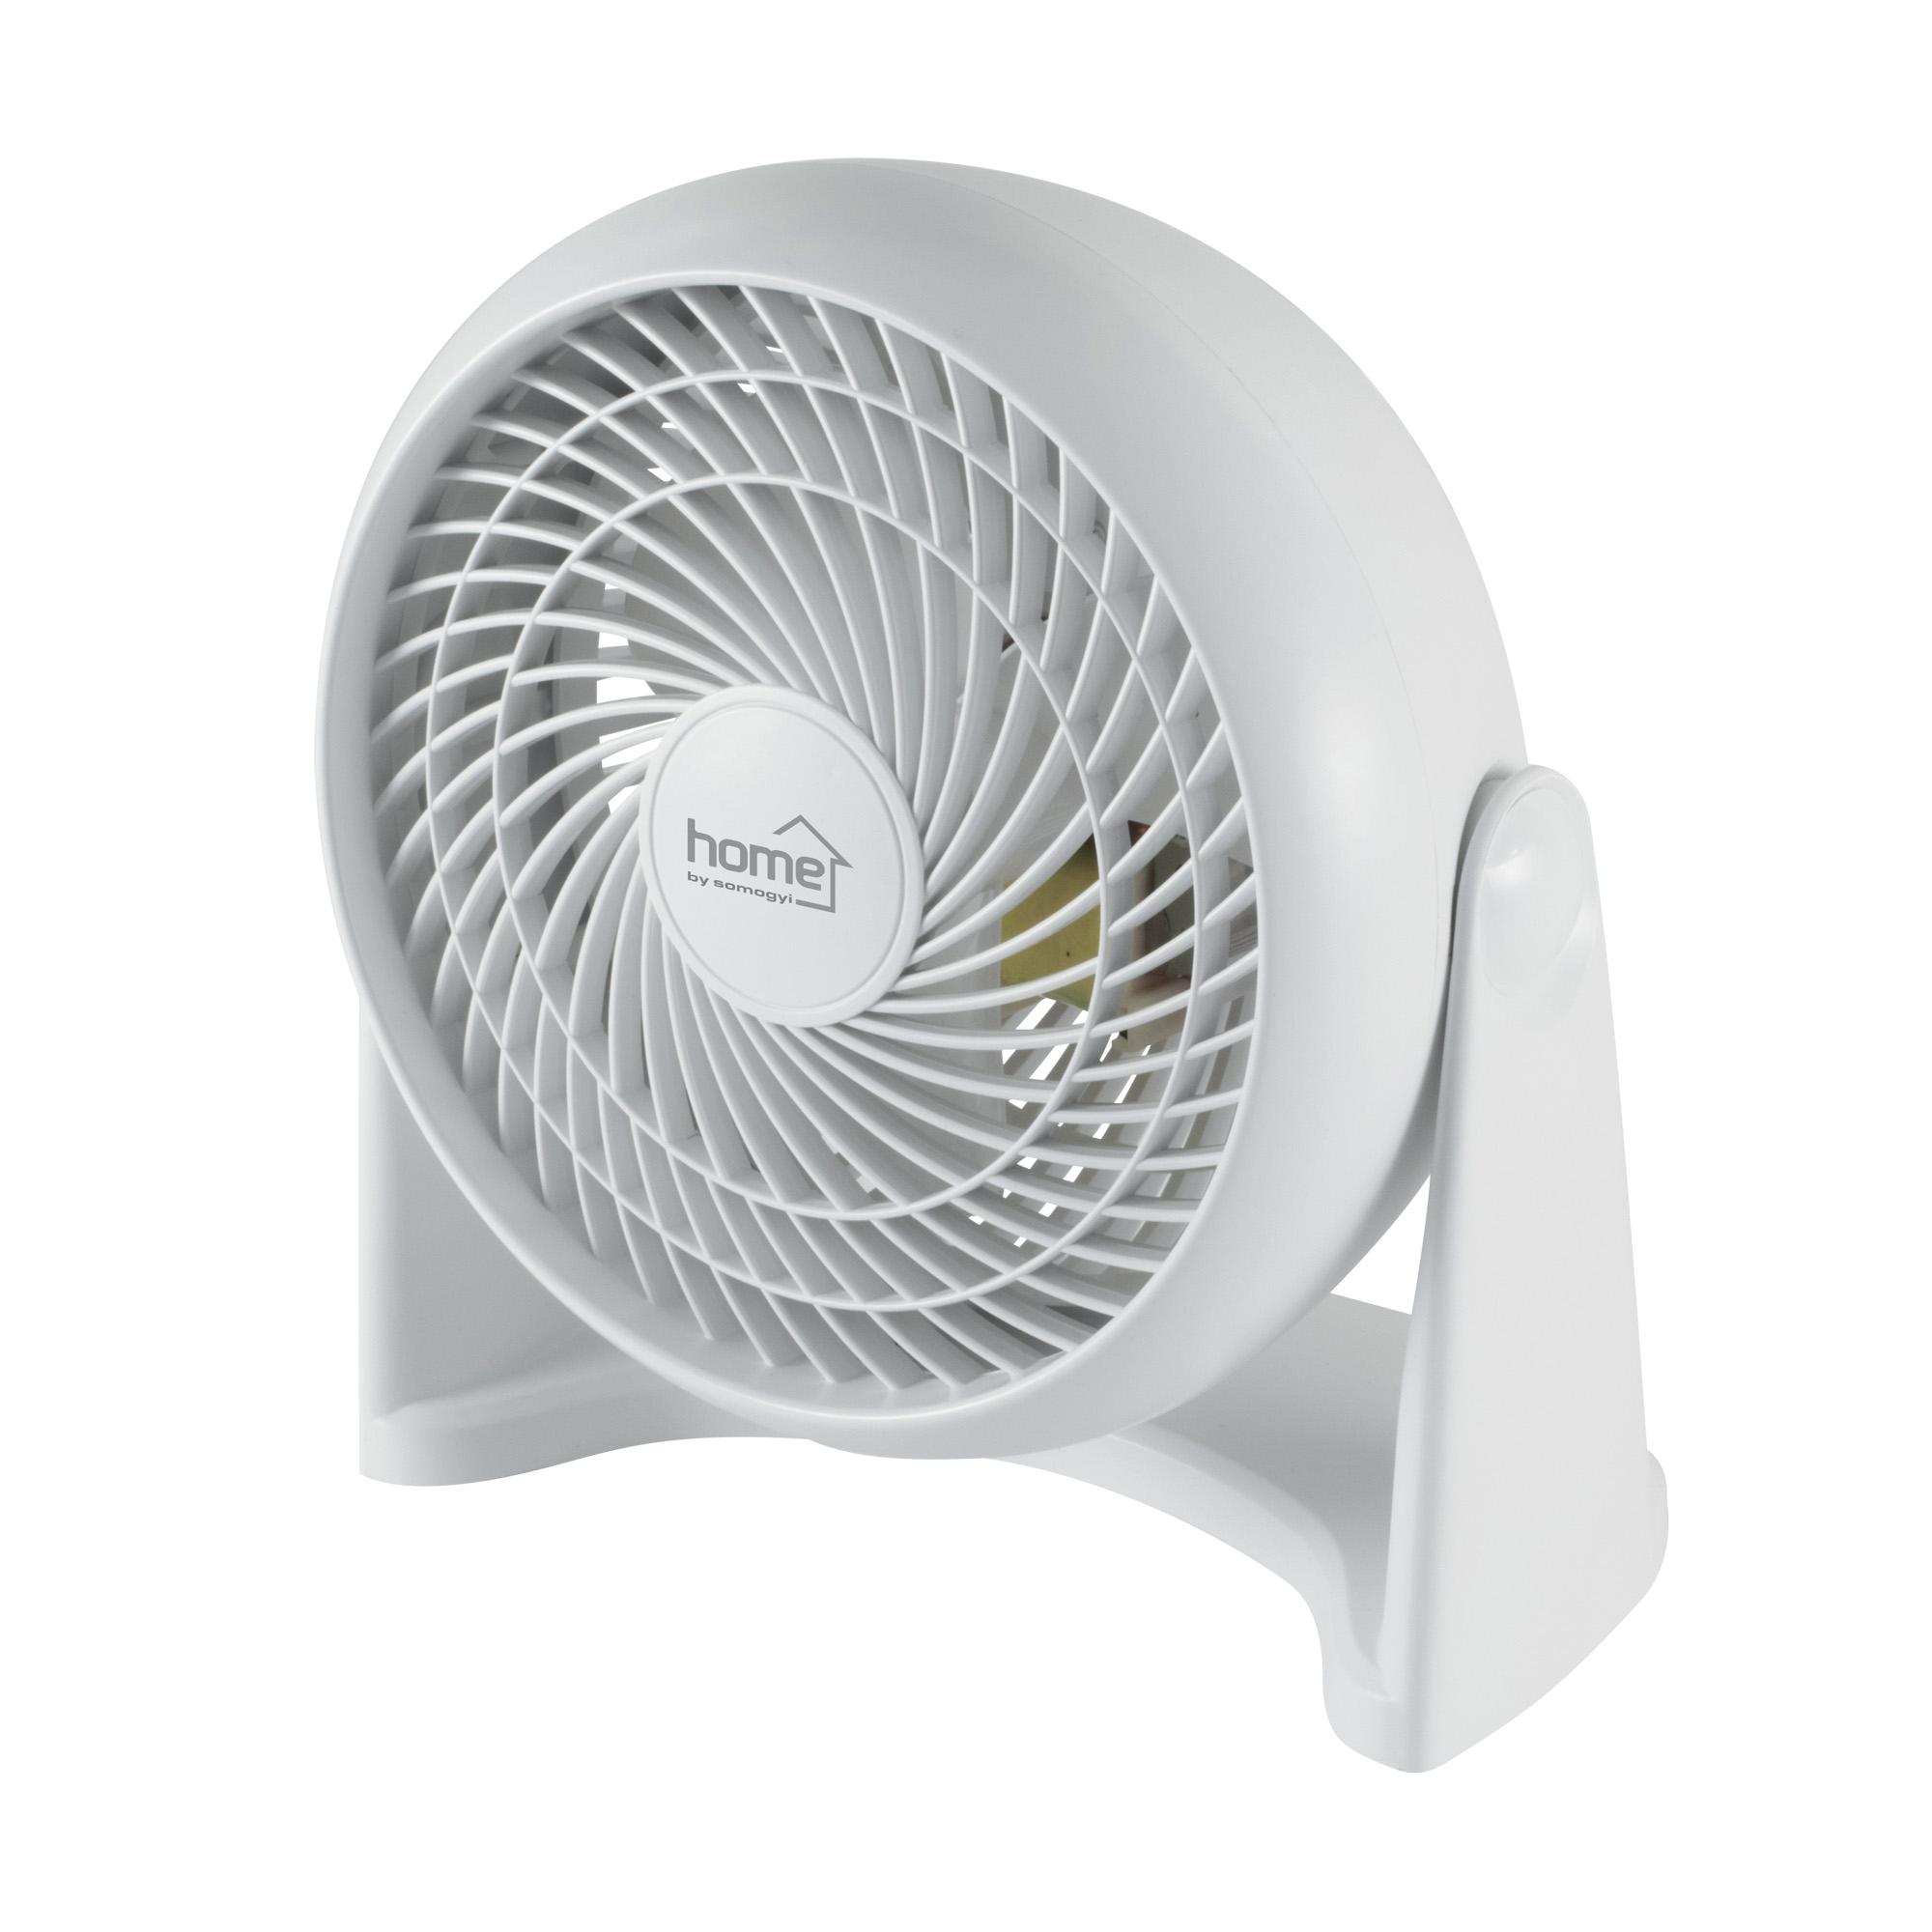 Home by Somogyi TF 23 TURBO asztali/fali ventilátor, 23cm, fehér